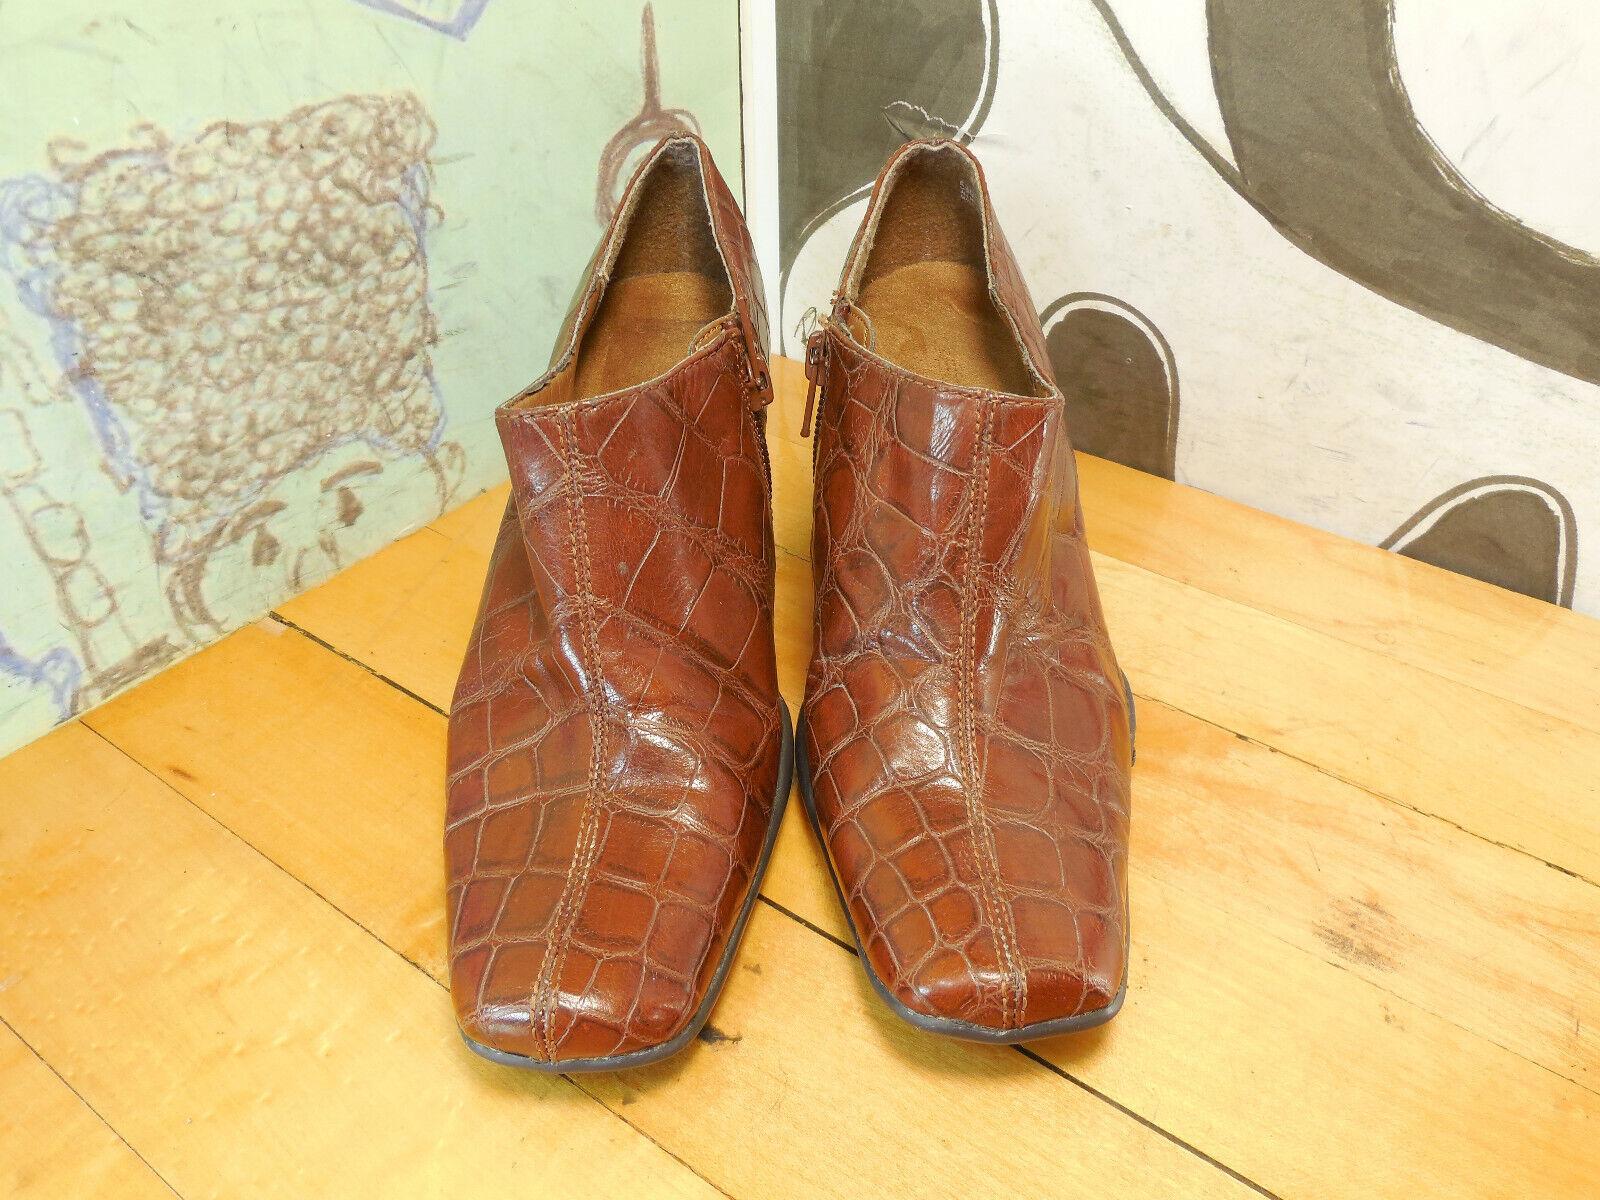 Aerosoles Brown Leather Booties Heels Womenh's 5.5B